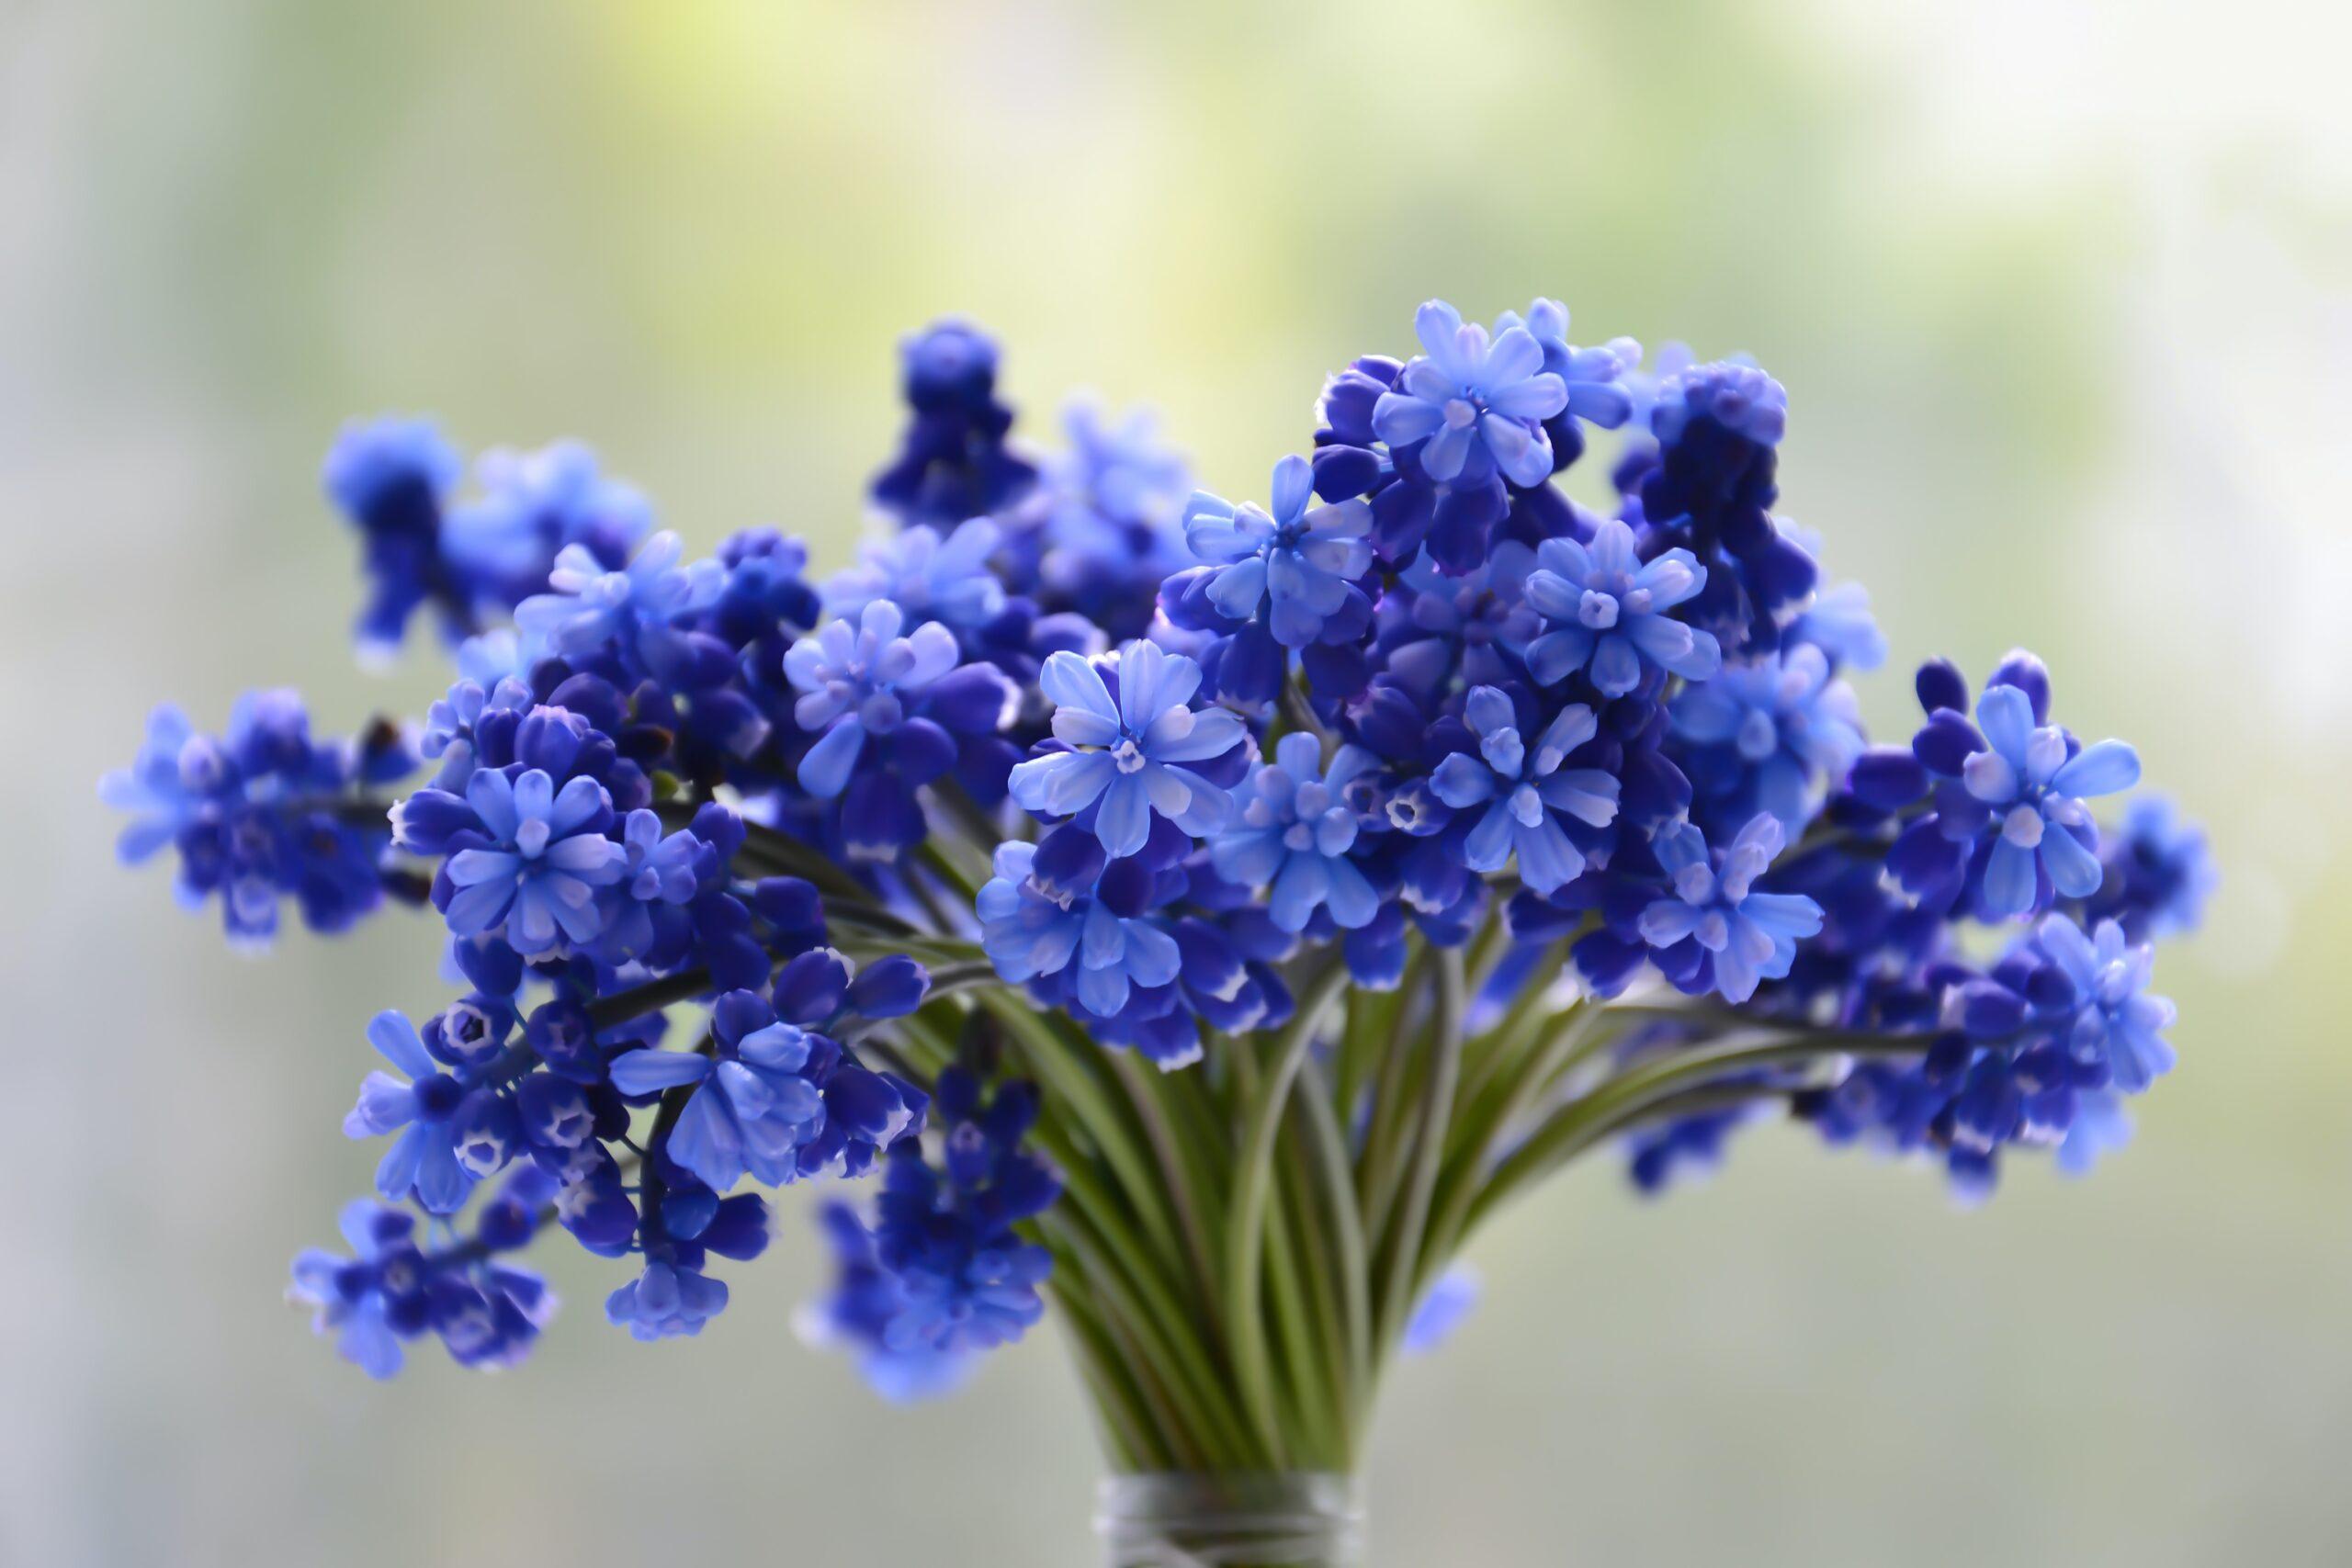 Aromatic Eye-catching Grandiose Popular Flowers